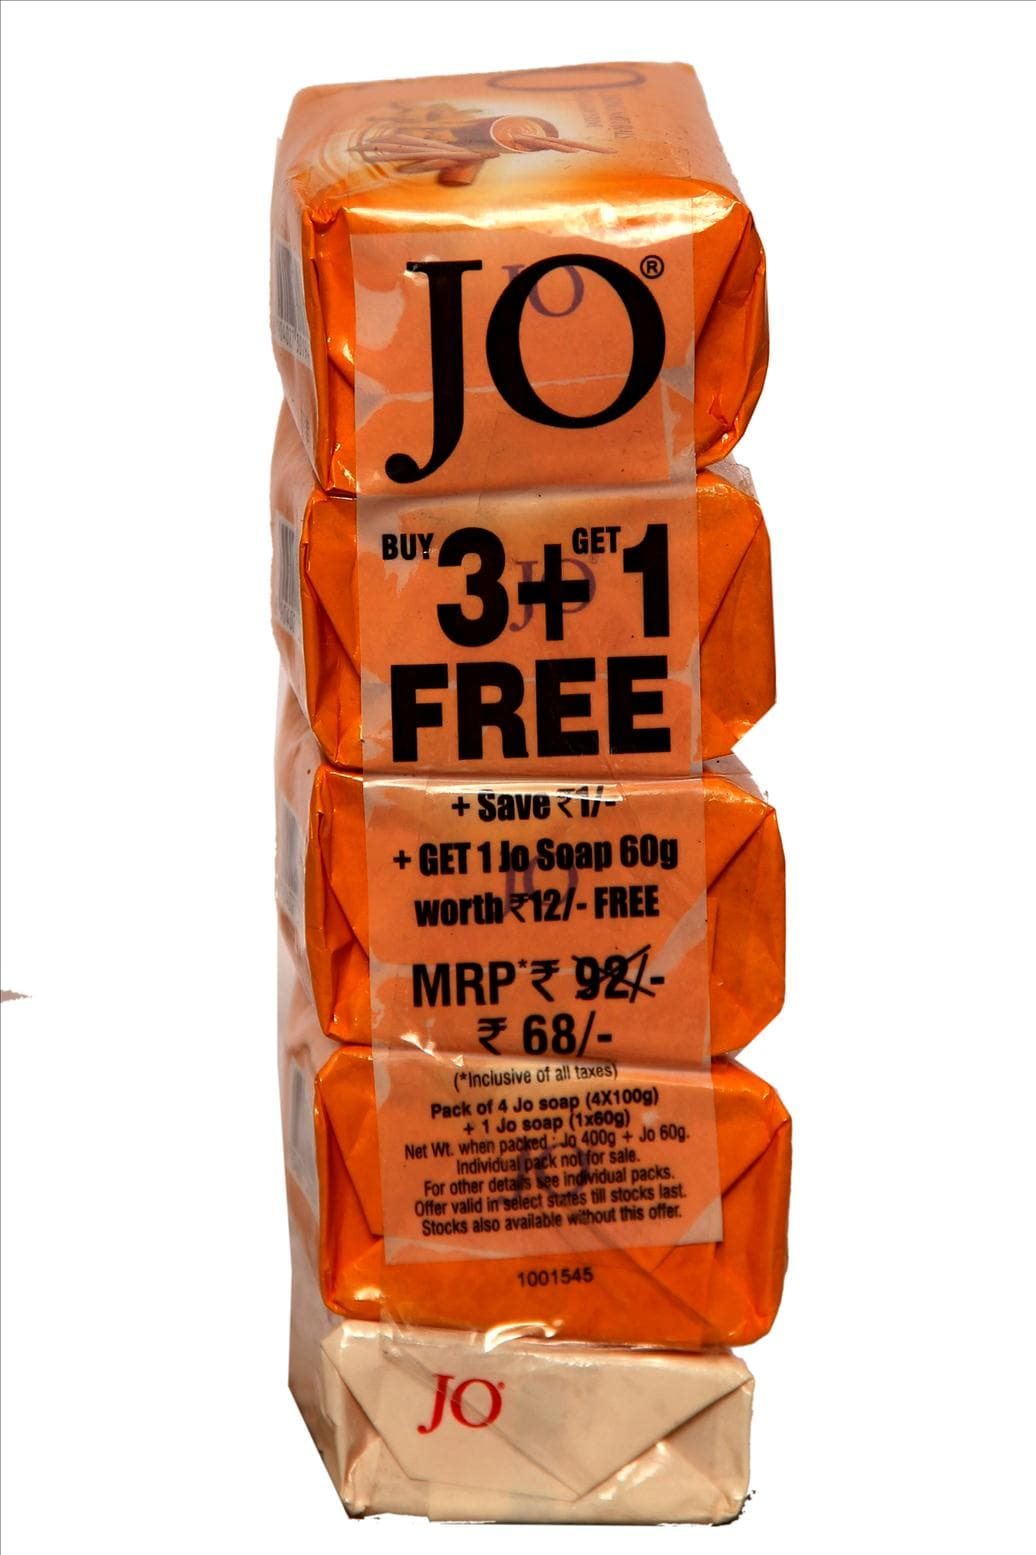 Jo Sandal & Turmeric Bathing Soap (Buy 3 Get 1 Free)